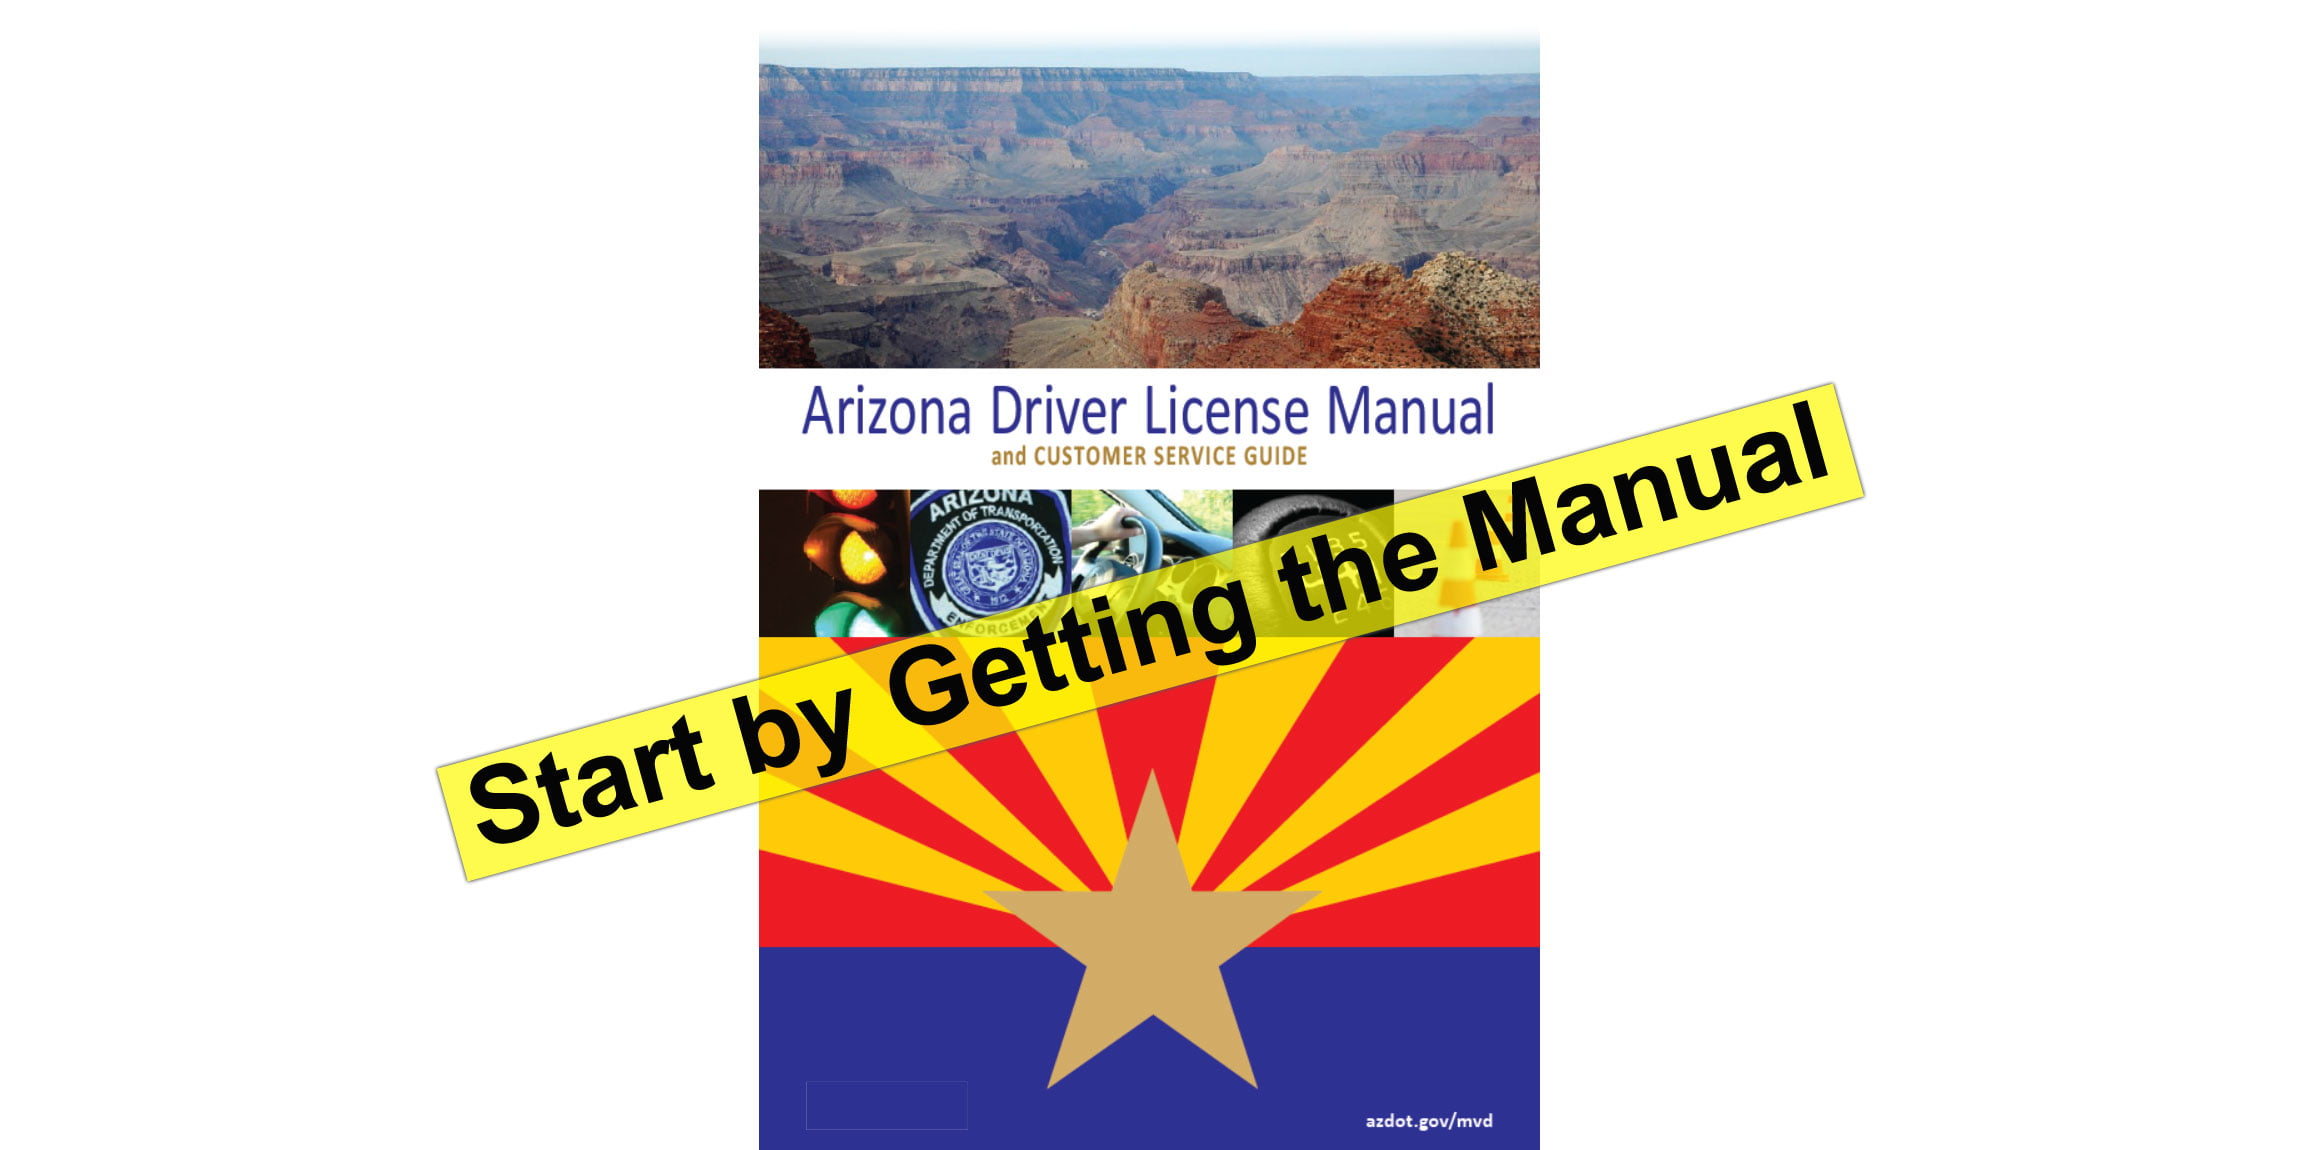 Get the Arizona Driver License Manual